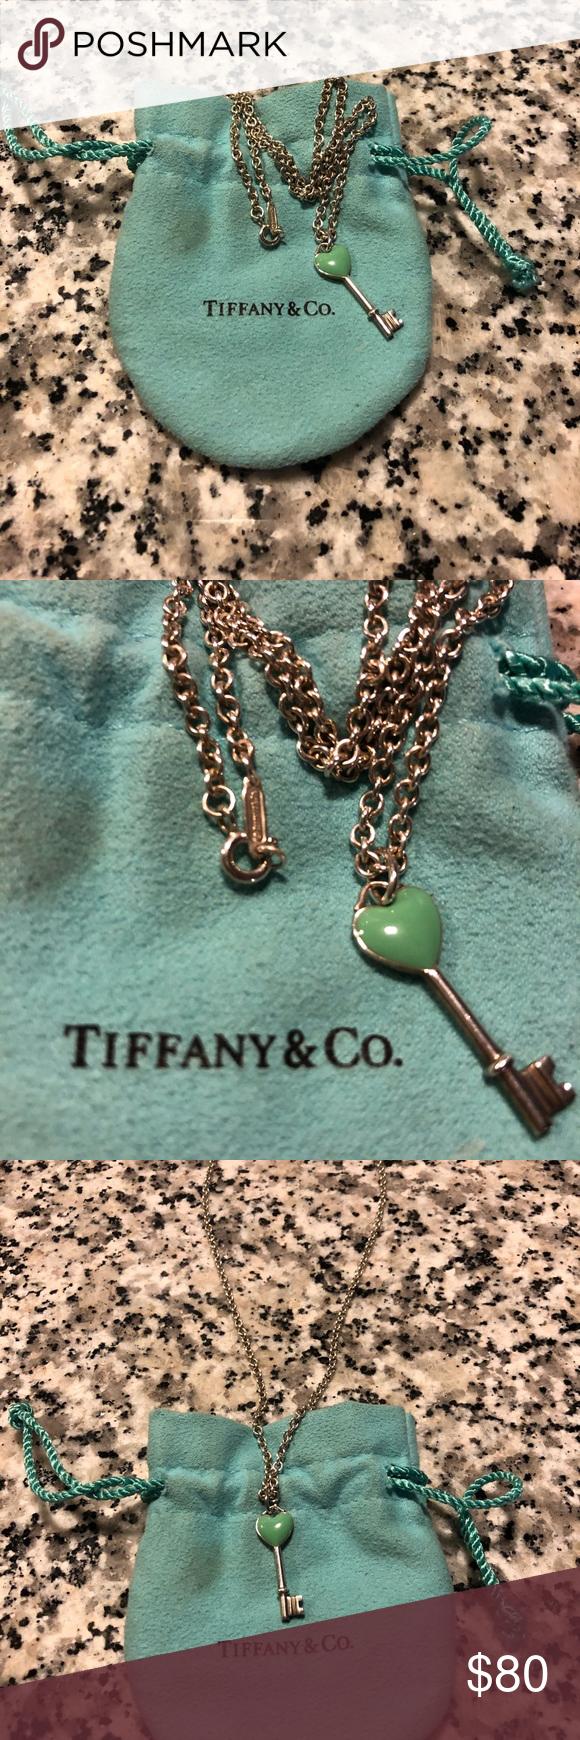 f7291c9a4de8 Tiffany   Co key necklace Tiffany   Co. Turquoise heart key pendant  necklace Tiffany   Co. Jewelry Necklaces